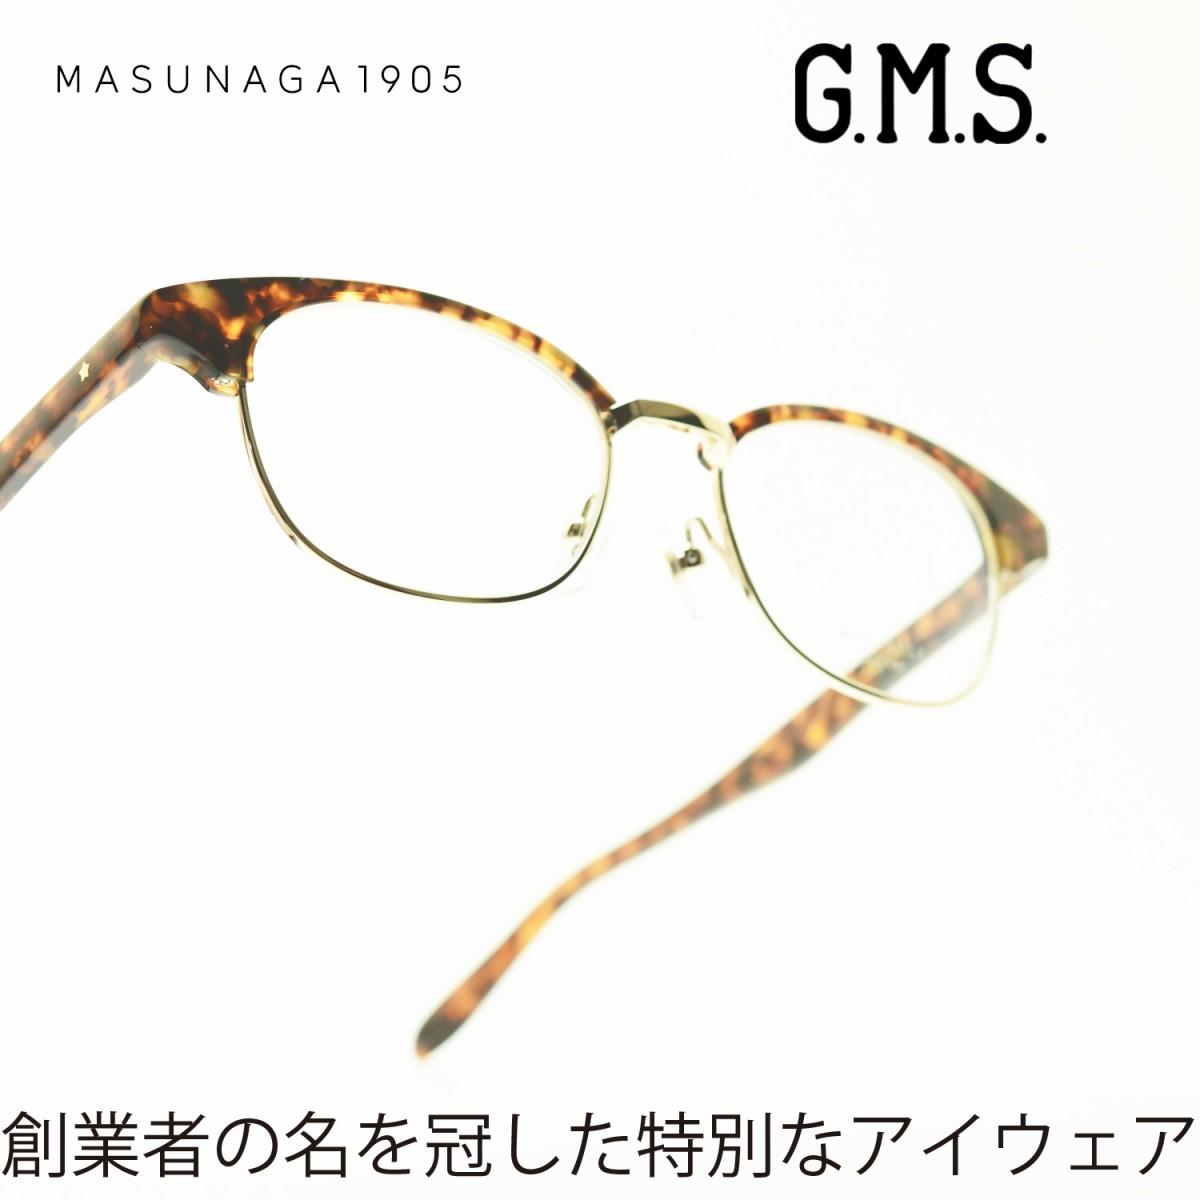 増永眼鏡 MASUNAGAGMS-31R col-13 DEMI